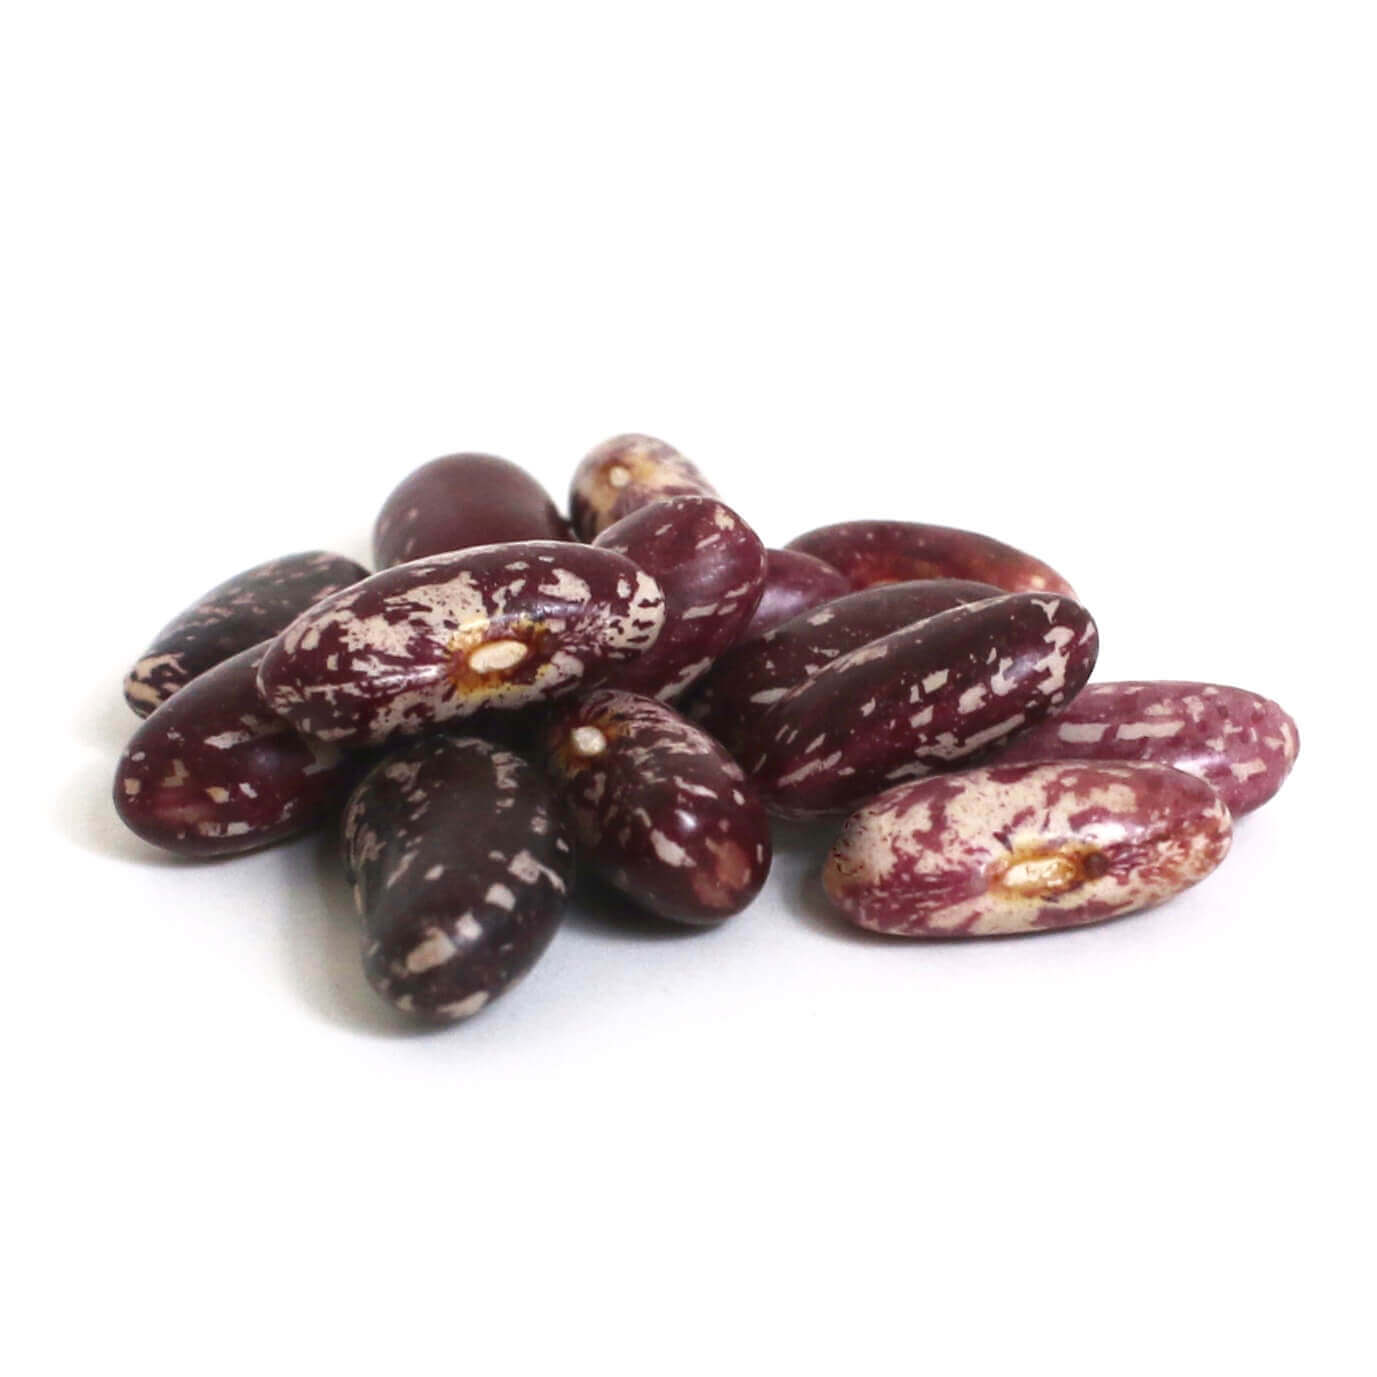 Spanish Tolosana Certified Organic Heirloom Beans | Shady Side Farm Holland Grand Rapids Michigan | Local Organic